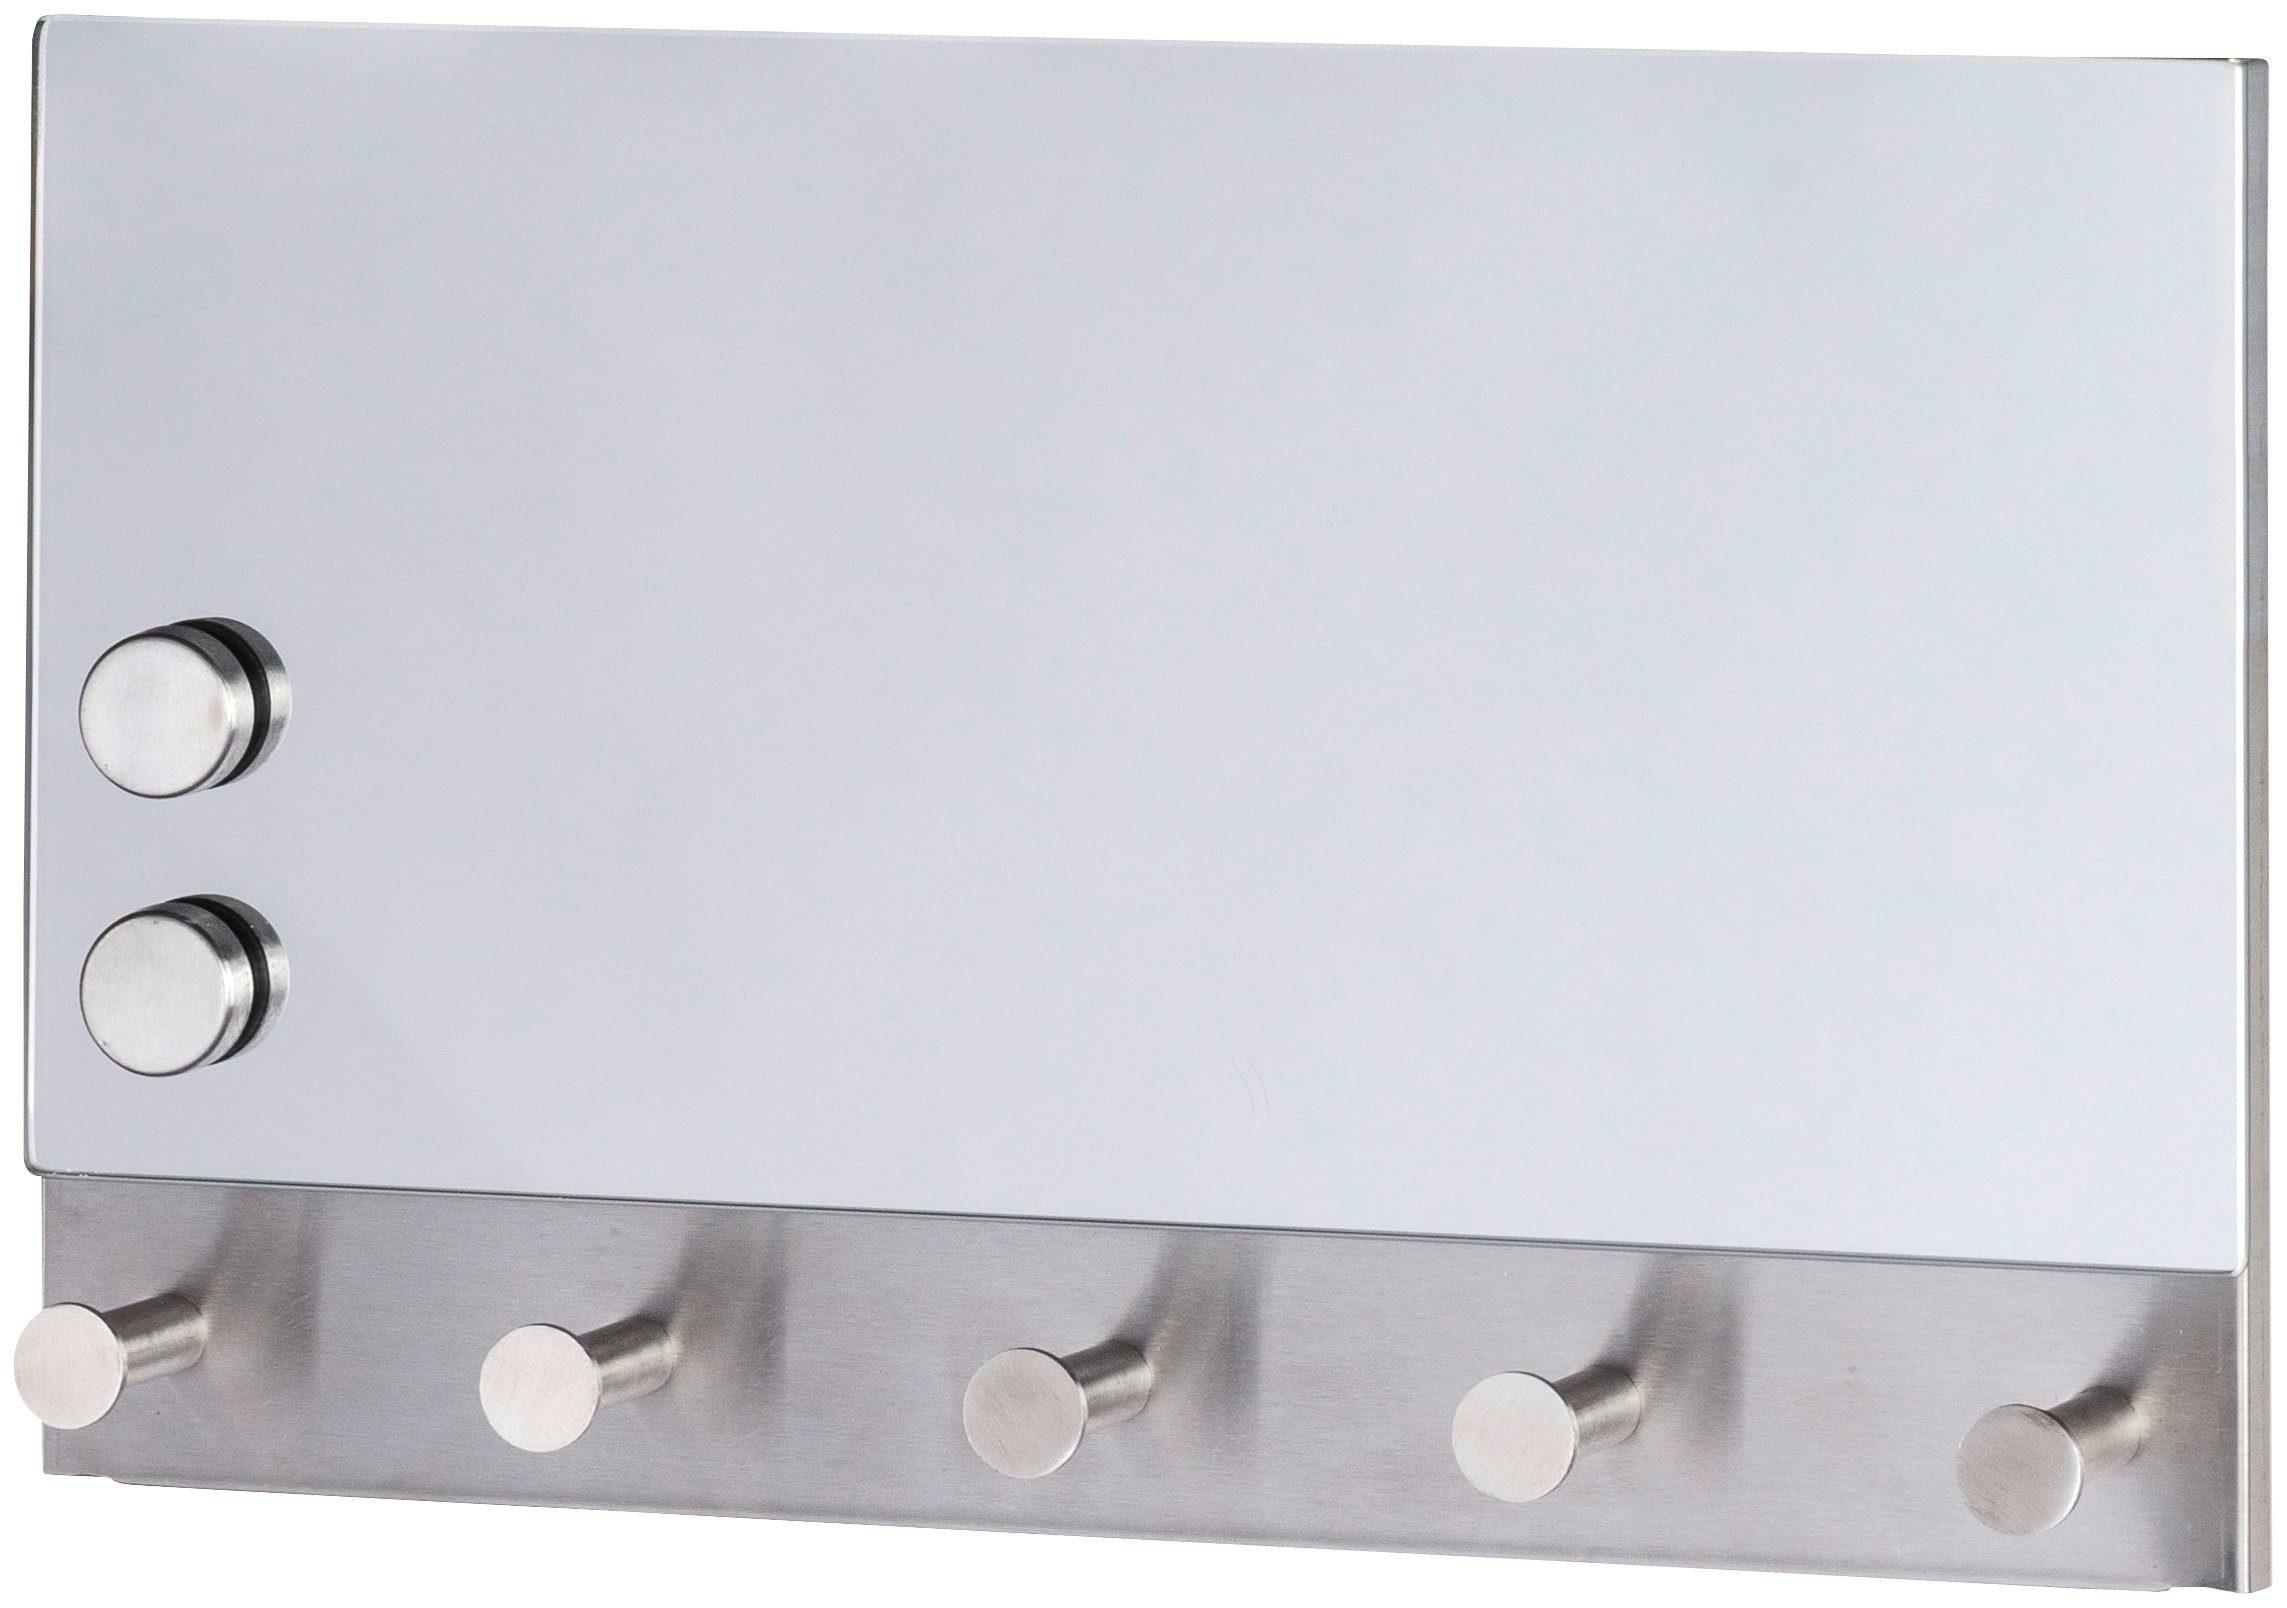 WENKO Garderobenhaken »Magnetische Garderobe Mirror«, 5 Haken, 30 x 19 cm